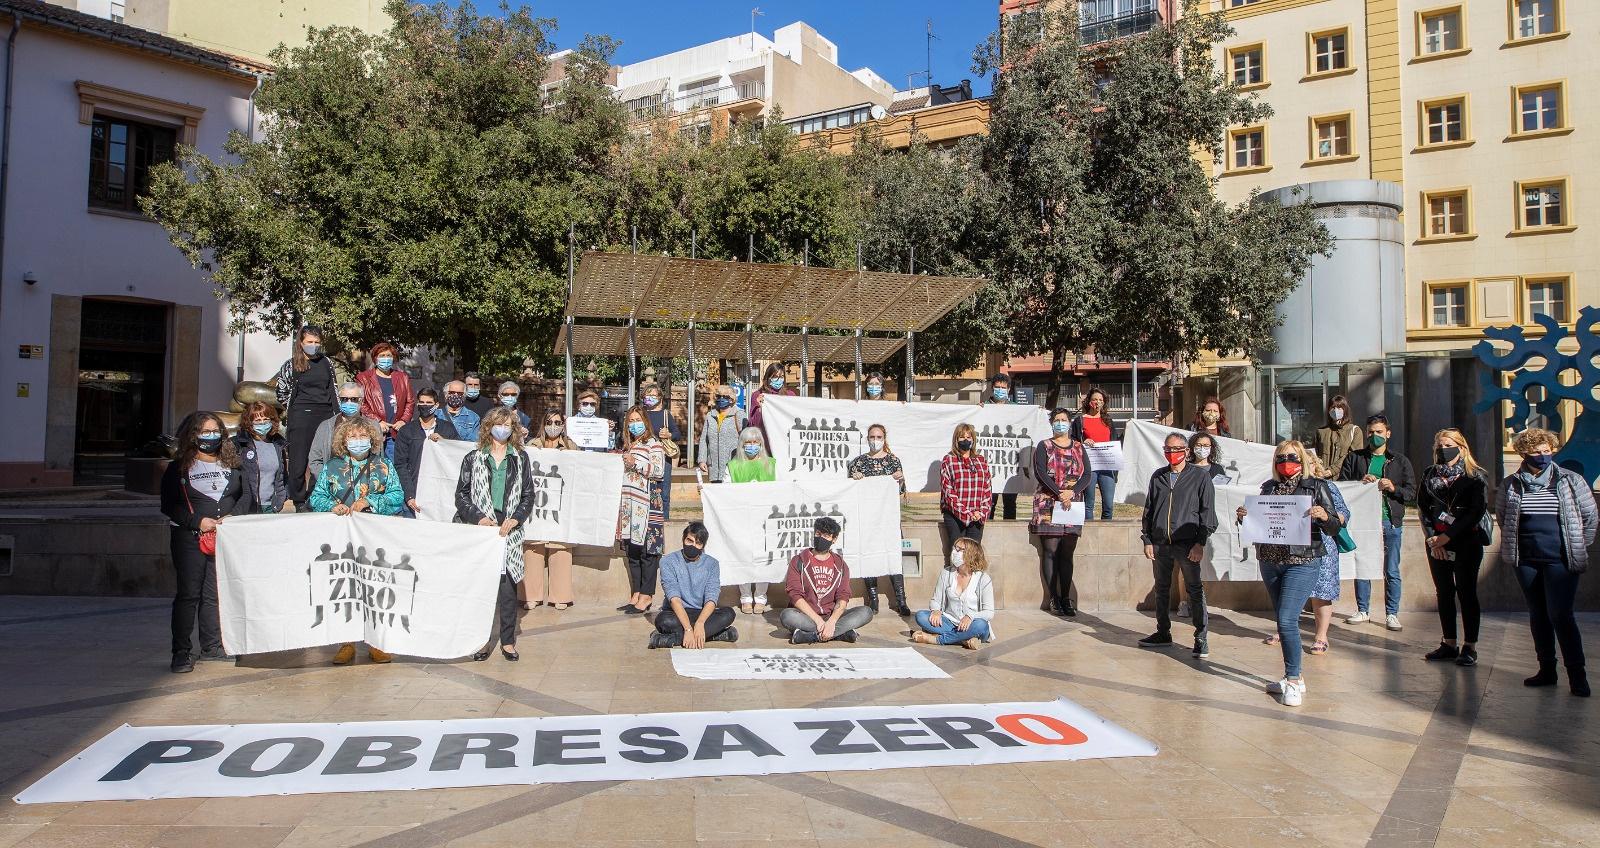 Concentración en Castellón de Pobresa Zero